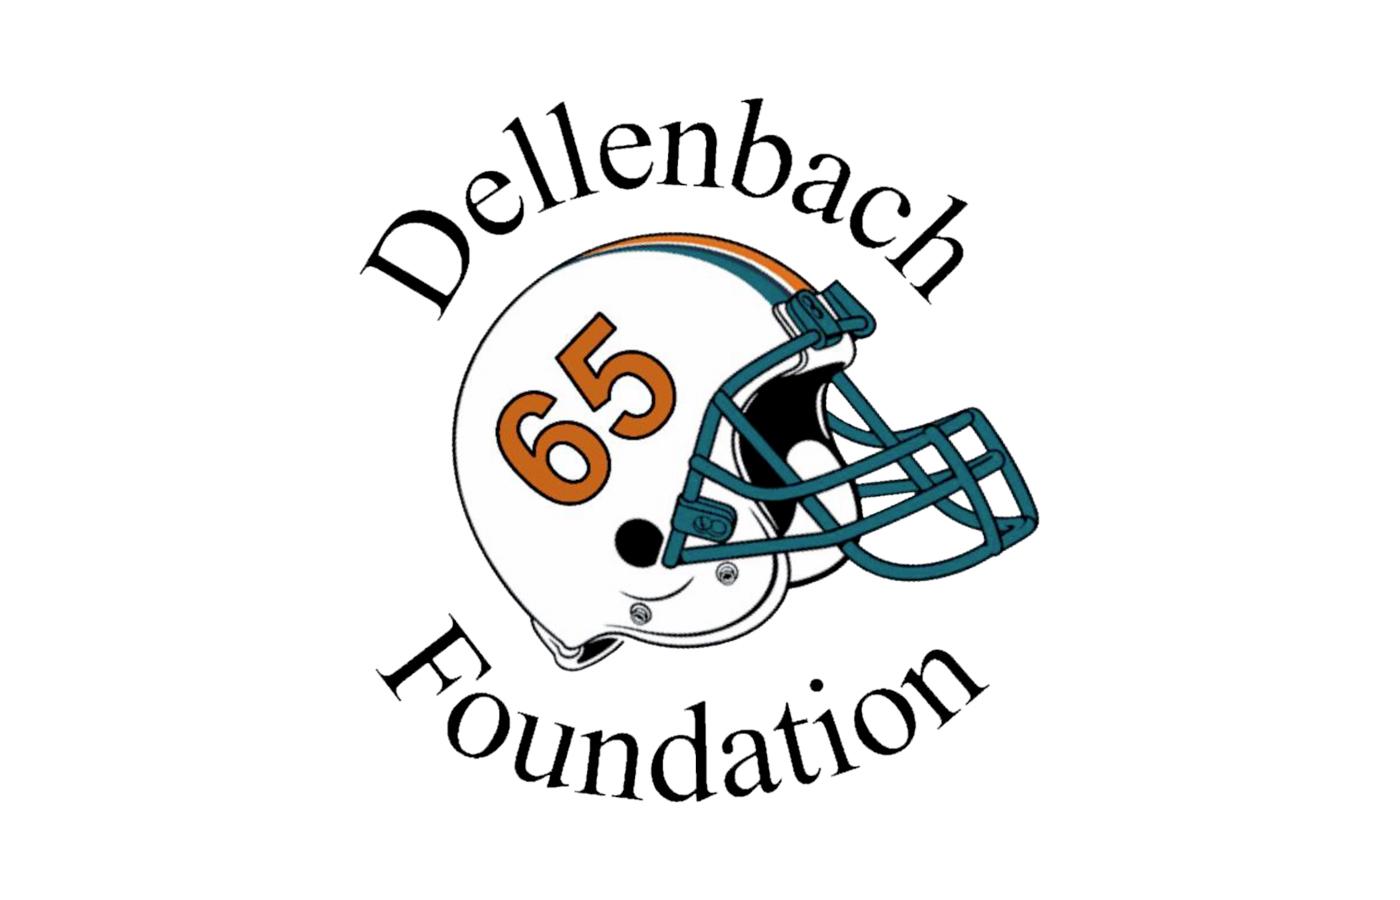 Denison Sponsors Charity Tournament [The Dellenbach Foundation]